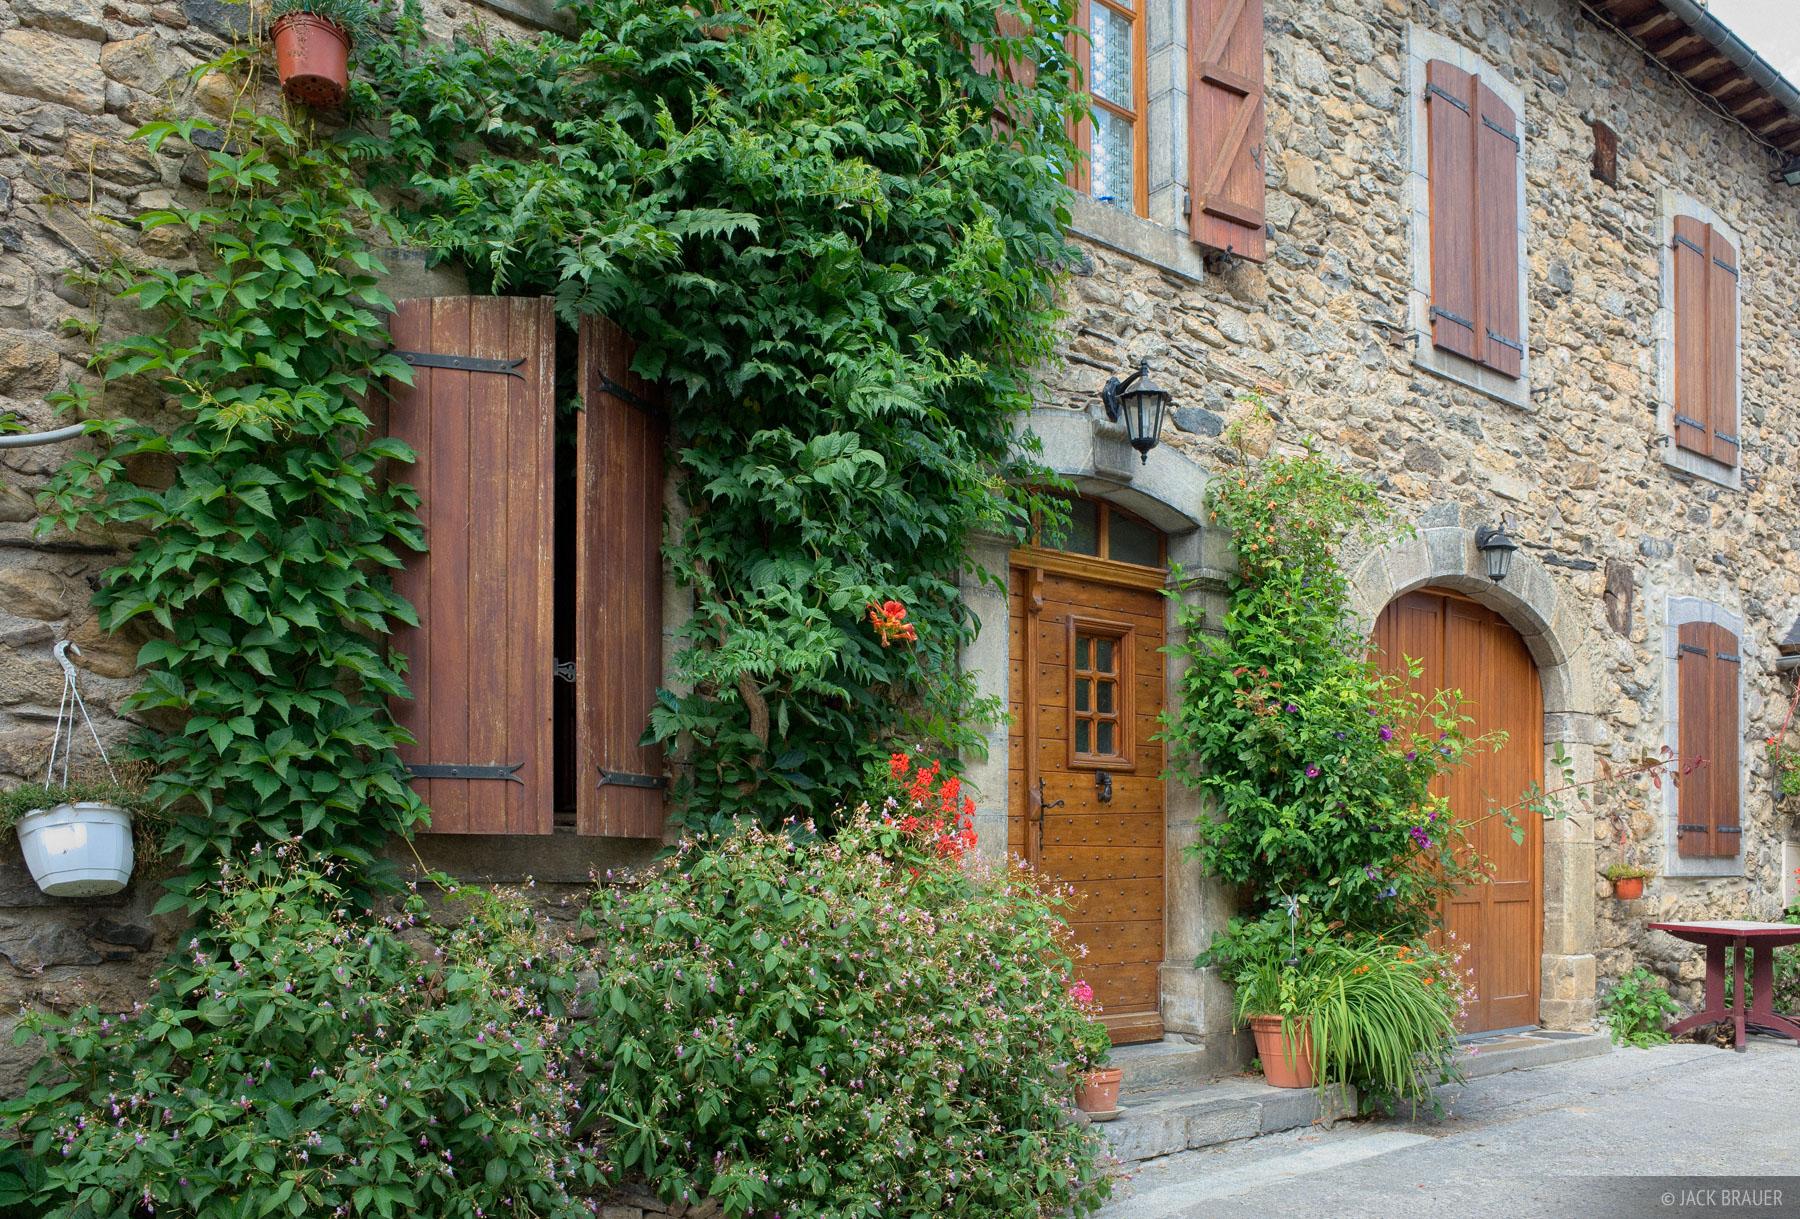 Lescun, Pyrenees, France, photo